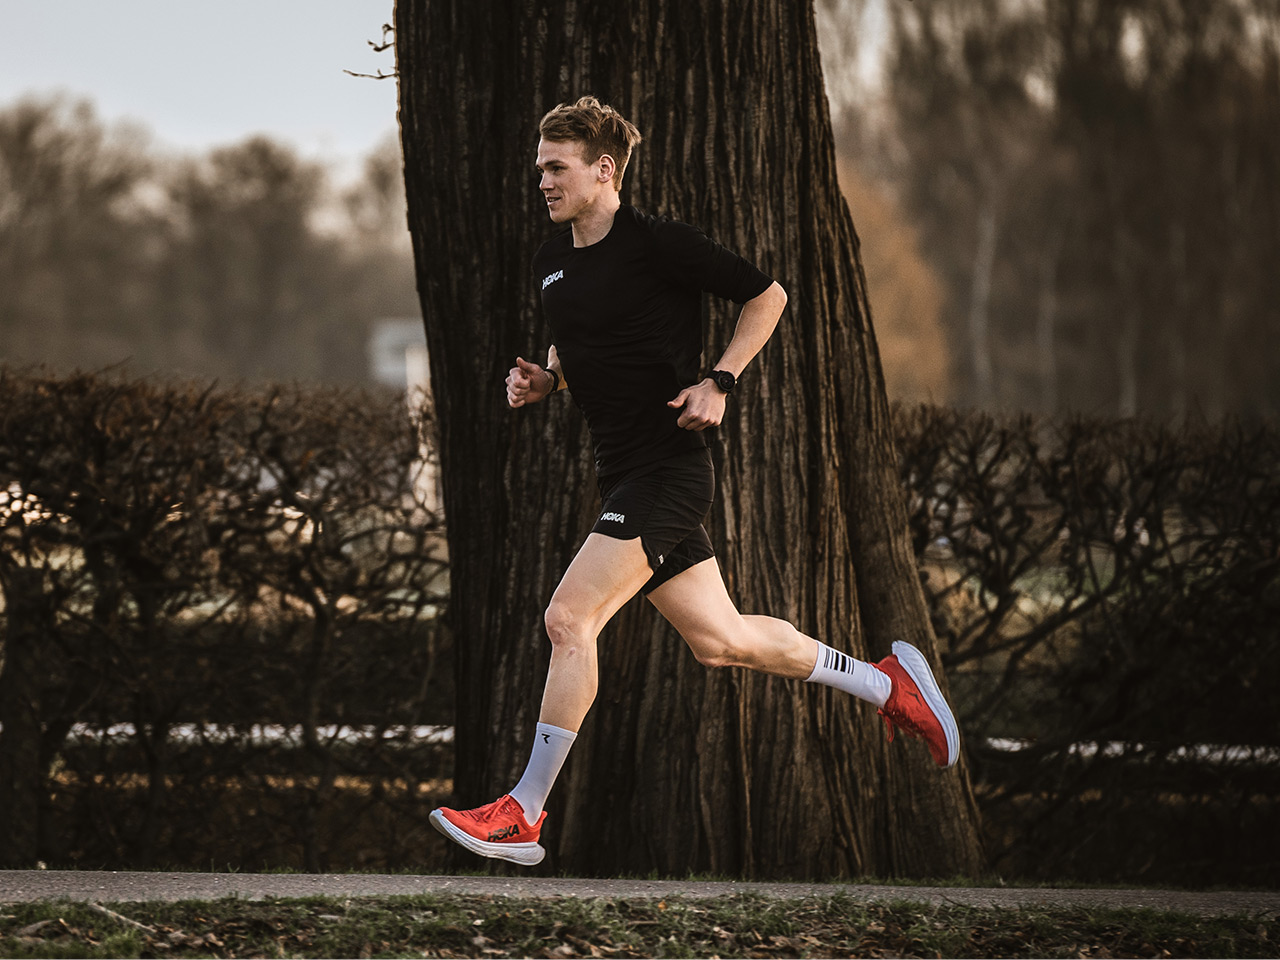 Ruben Zepuntke running in the CARBON X 2